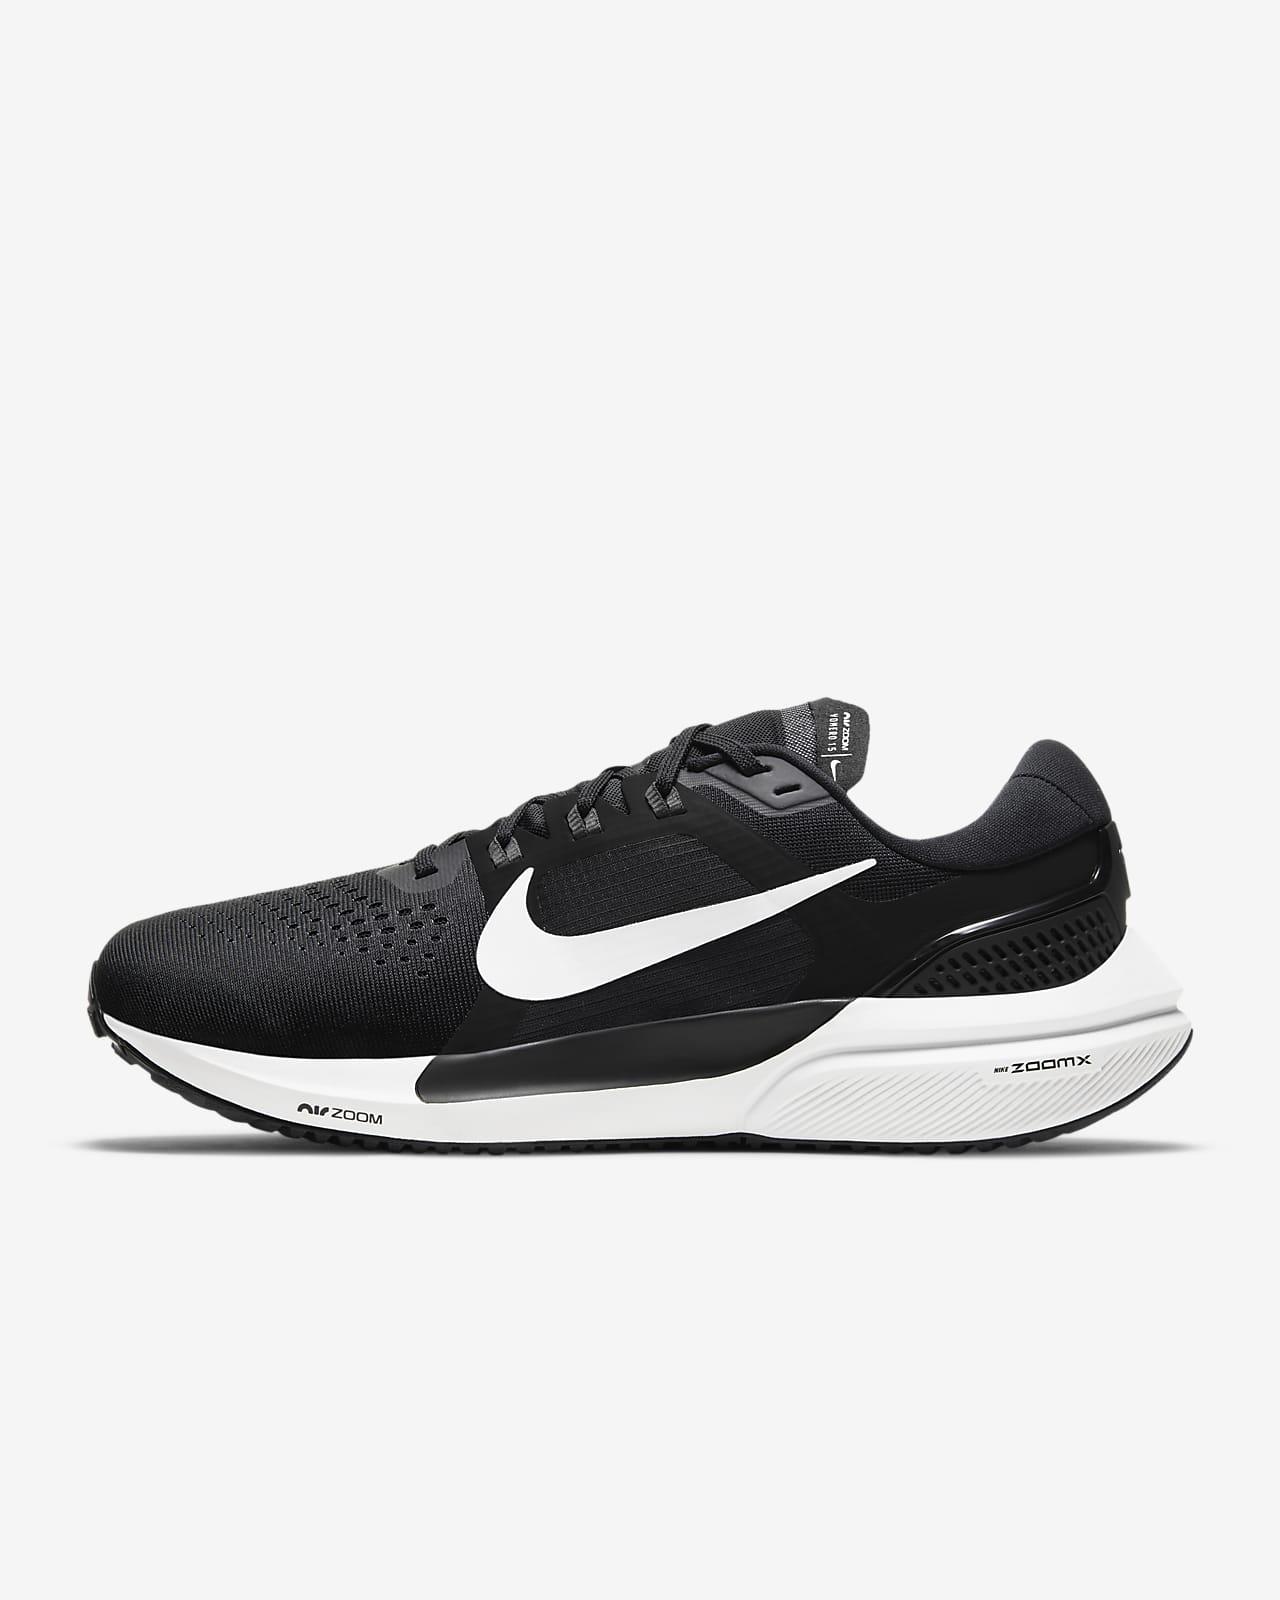 Nike Air Zoom Vomero 15 Men's Running Shoe (Extra Wide)